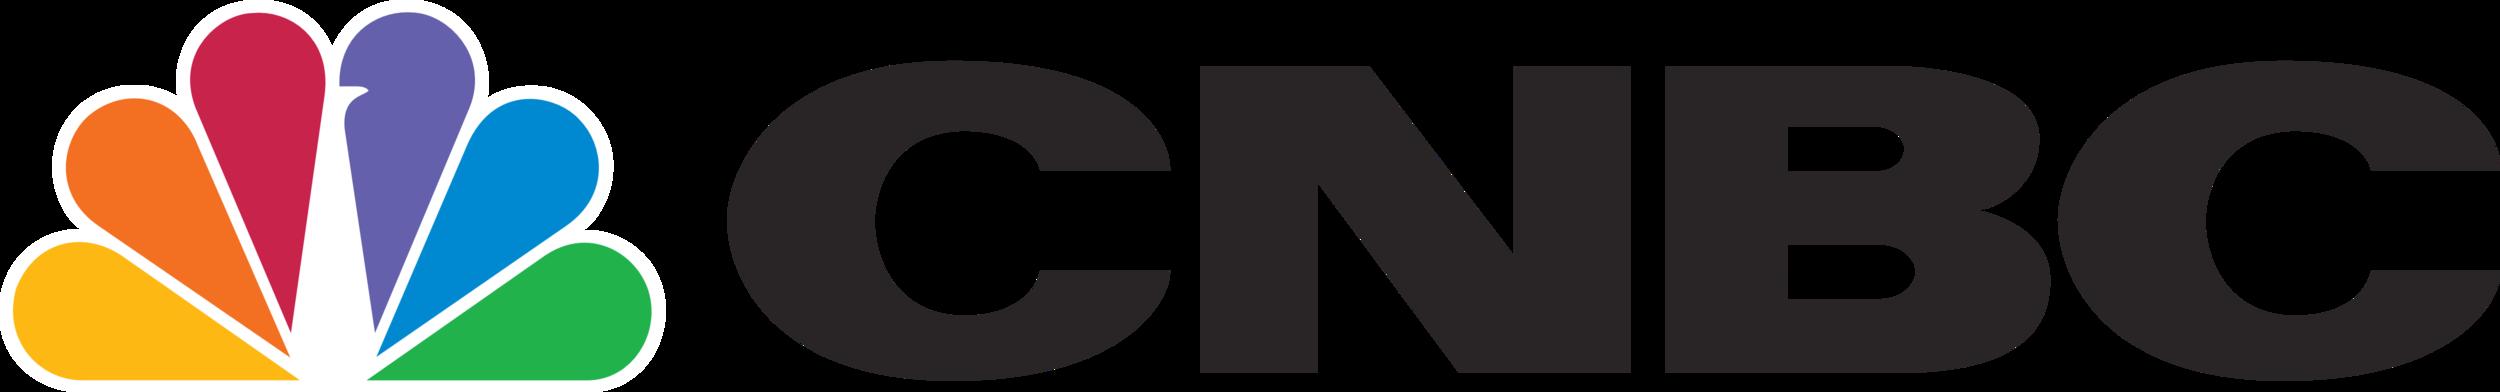 CNBC_logo_horizontal.png